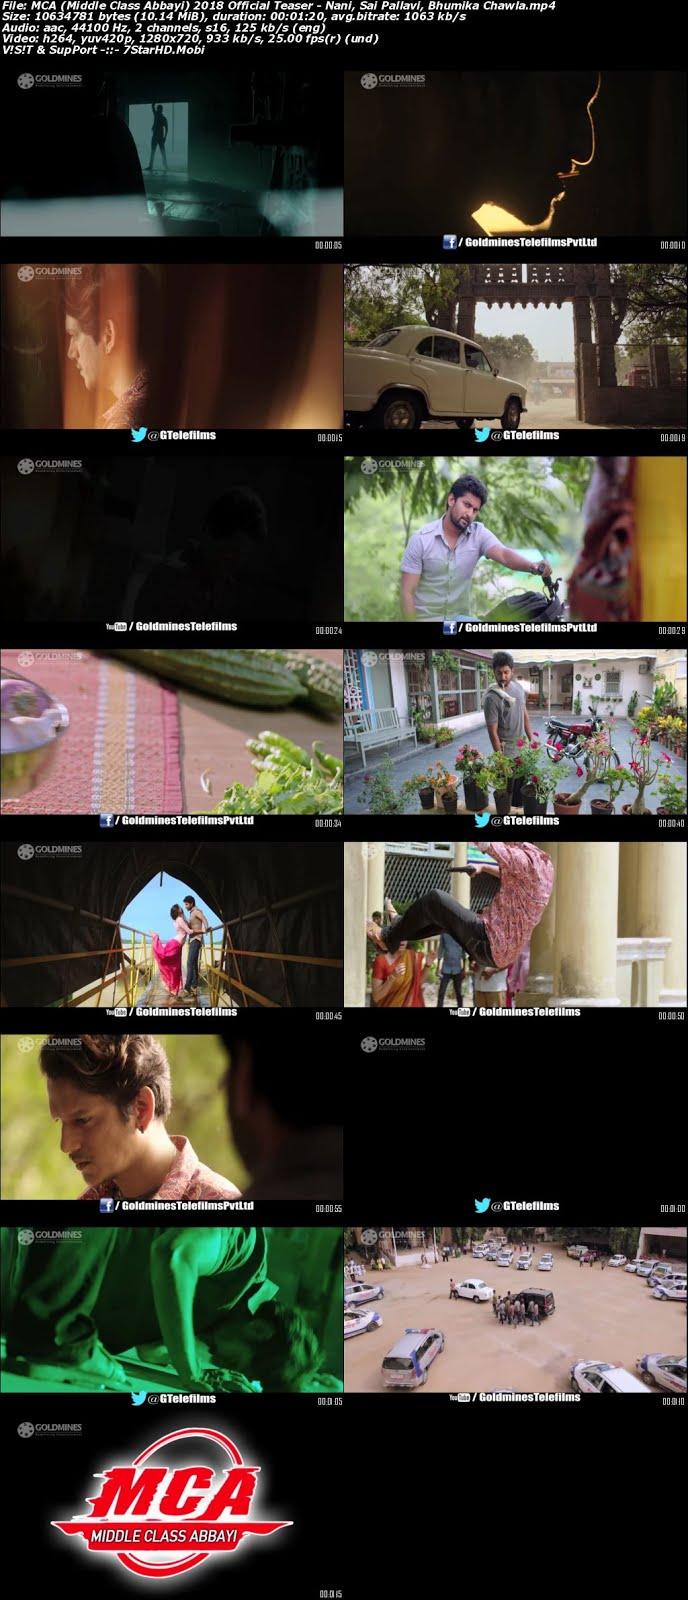 MCA (Middle Class Abbayi) 2018 Hindi Official Teaser 720p HD Dwonload 2